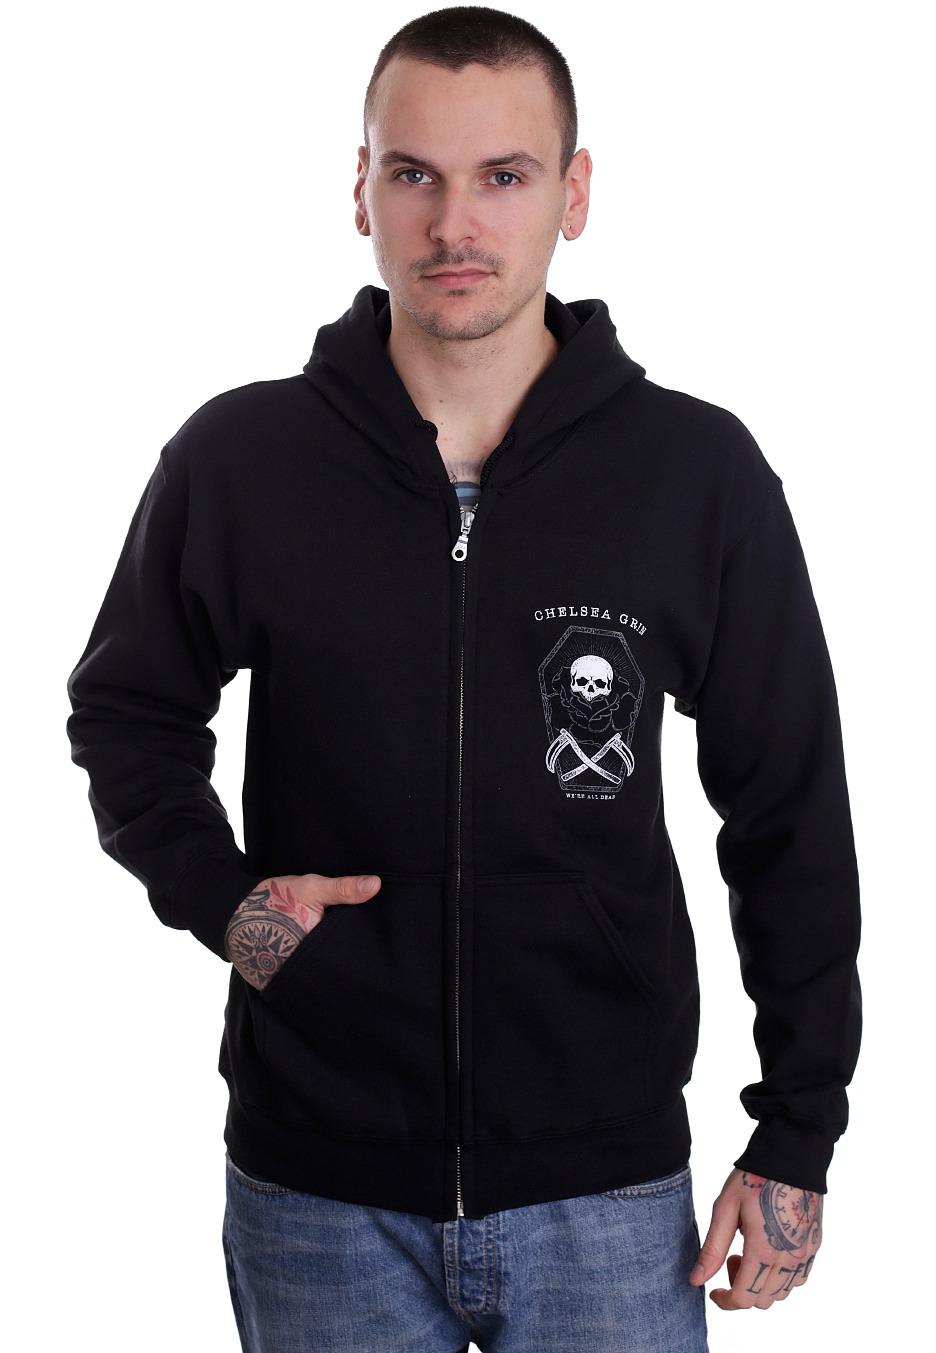 chelsea grin coffin zipper official deathcore merchandise shop uk. Black Bedroom Furniture Sets. Home Design Ideas